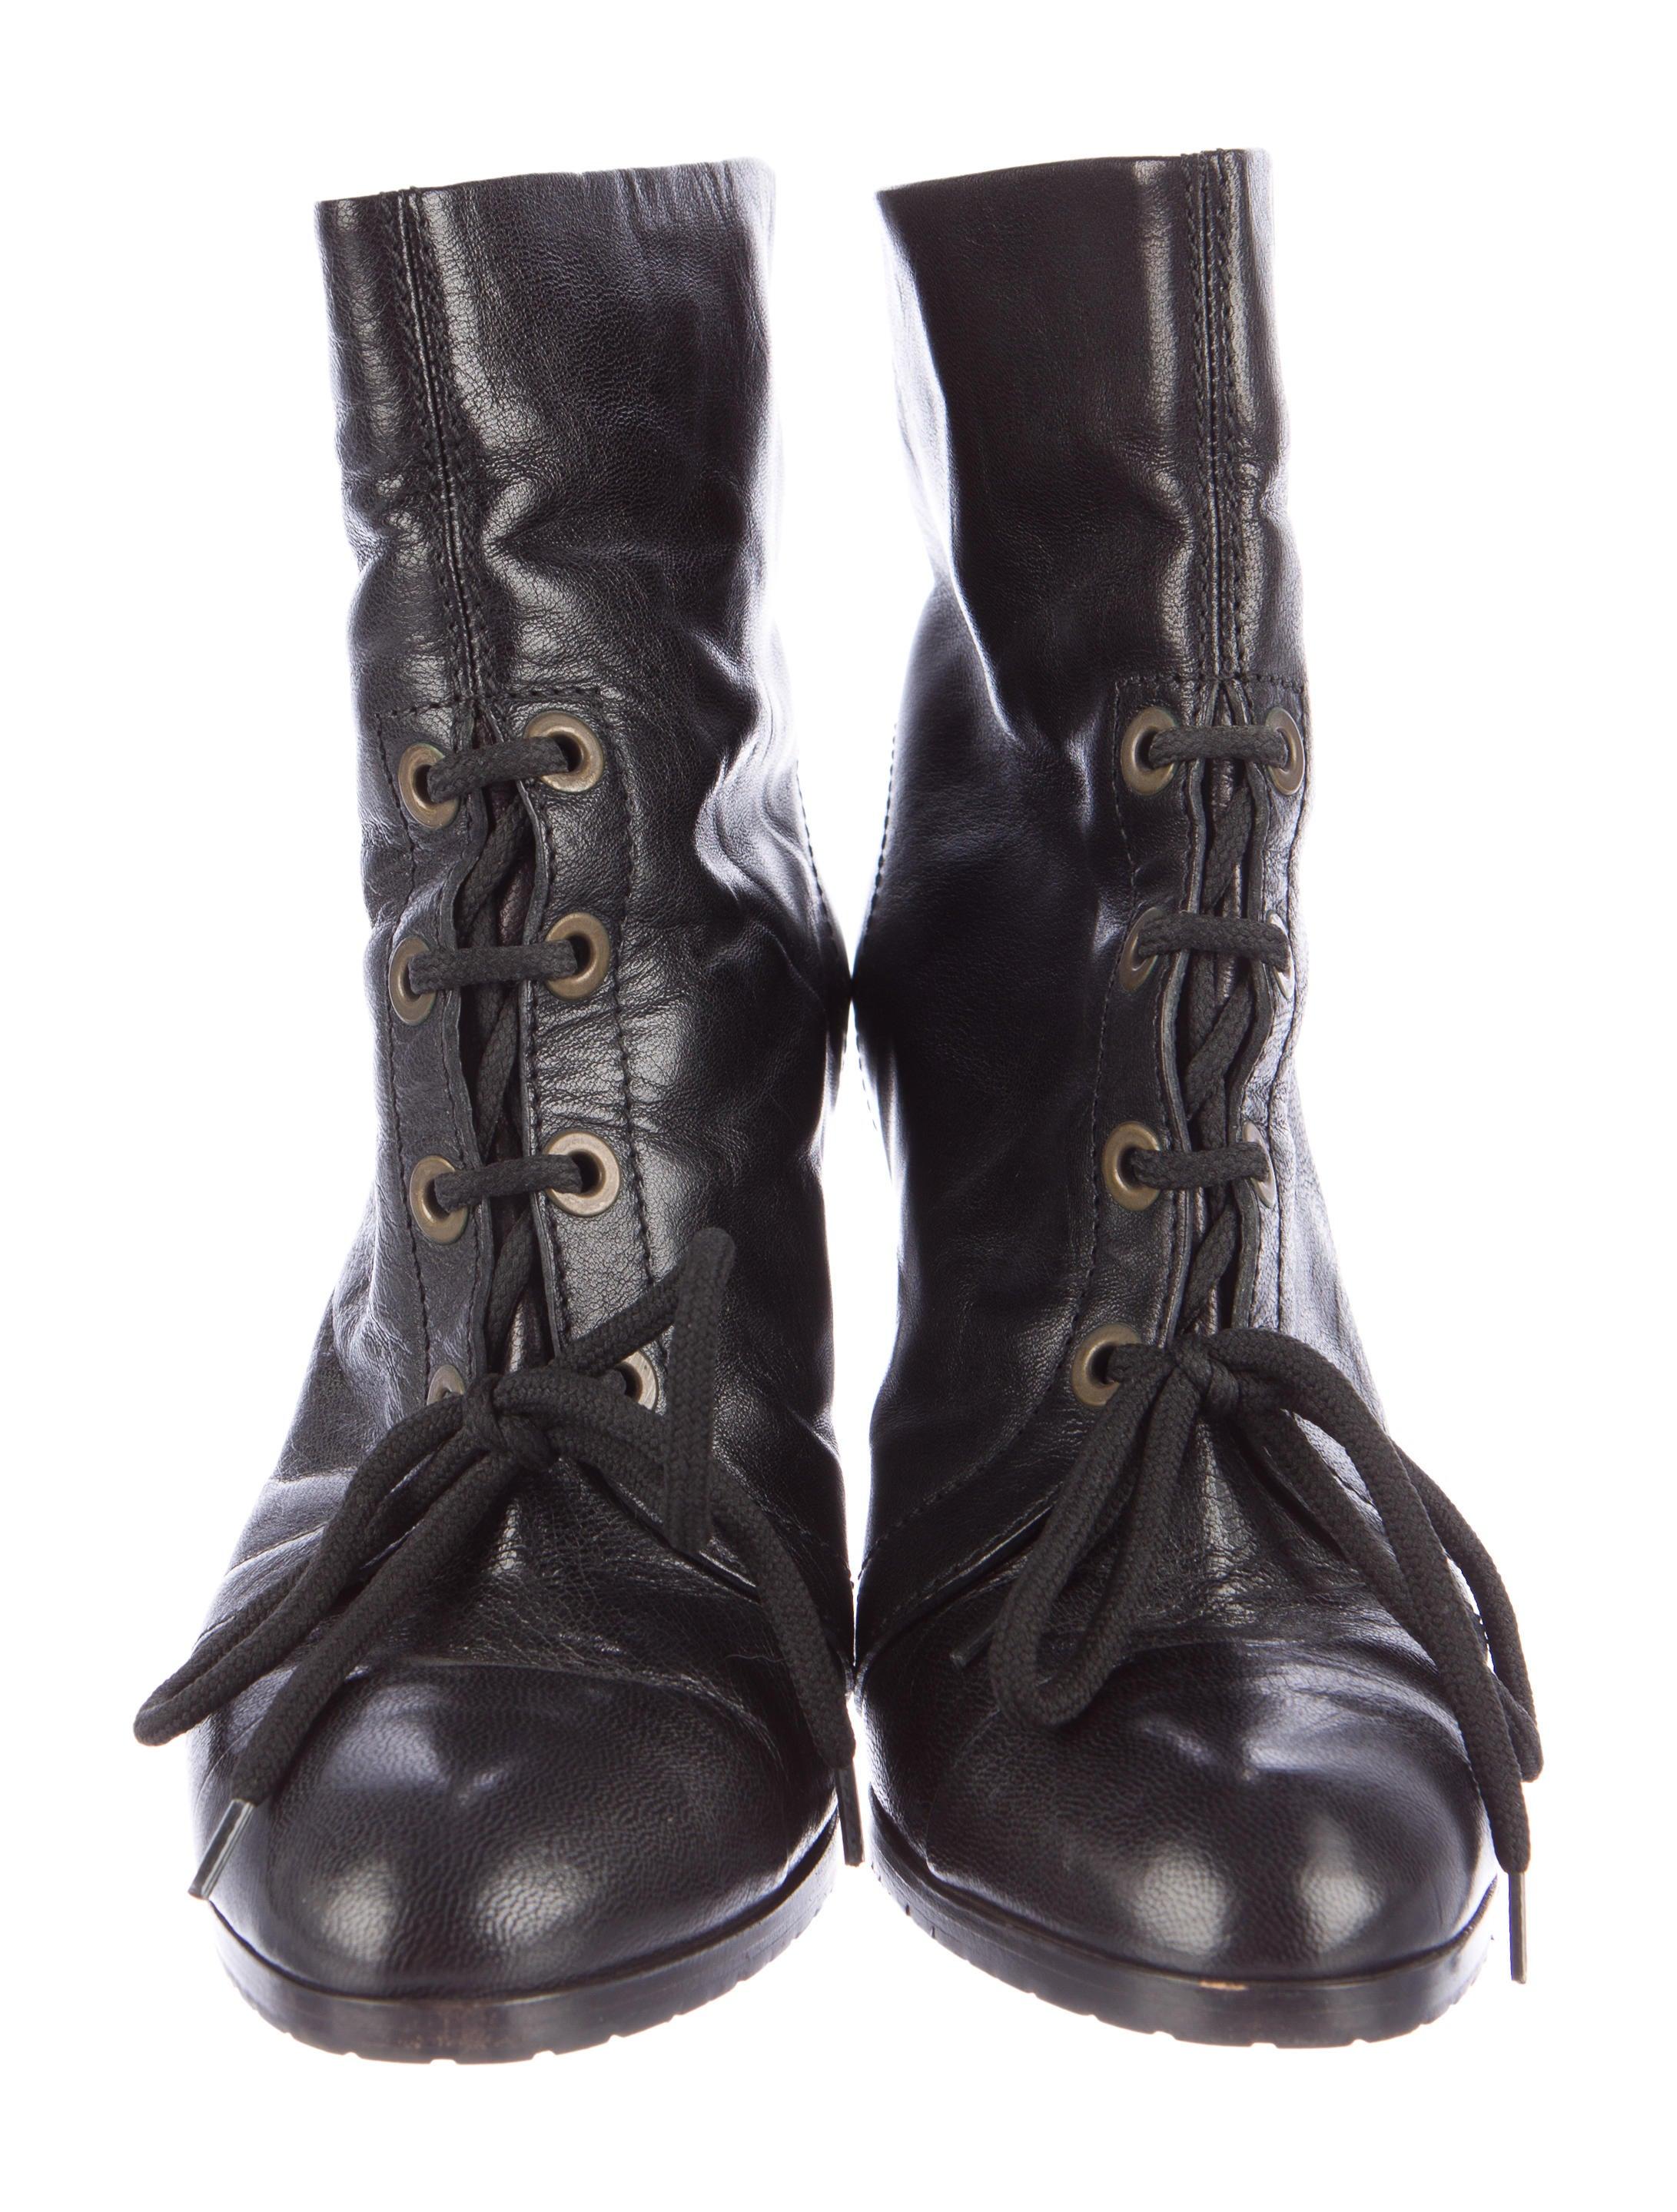 derek lam leather lace up ankle boots shoes der27064